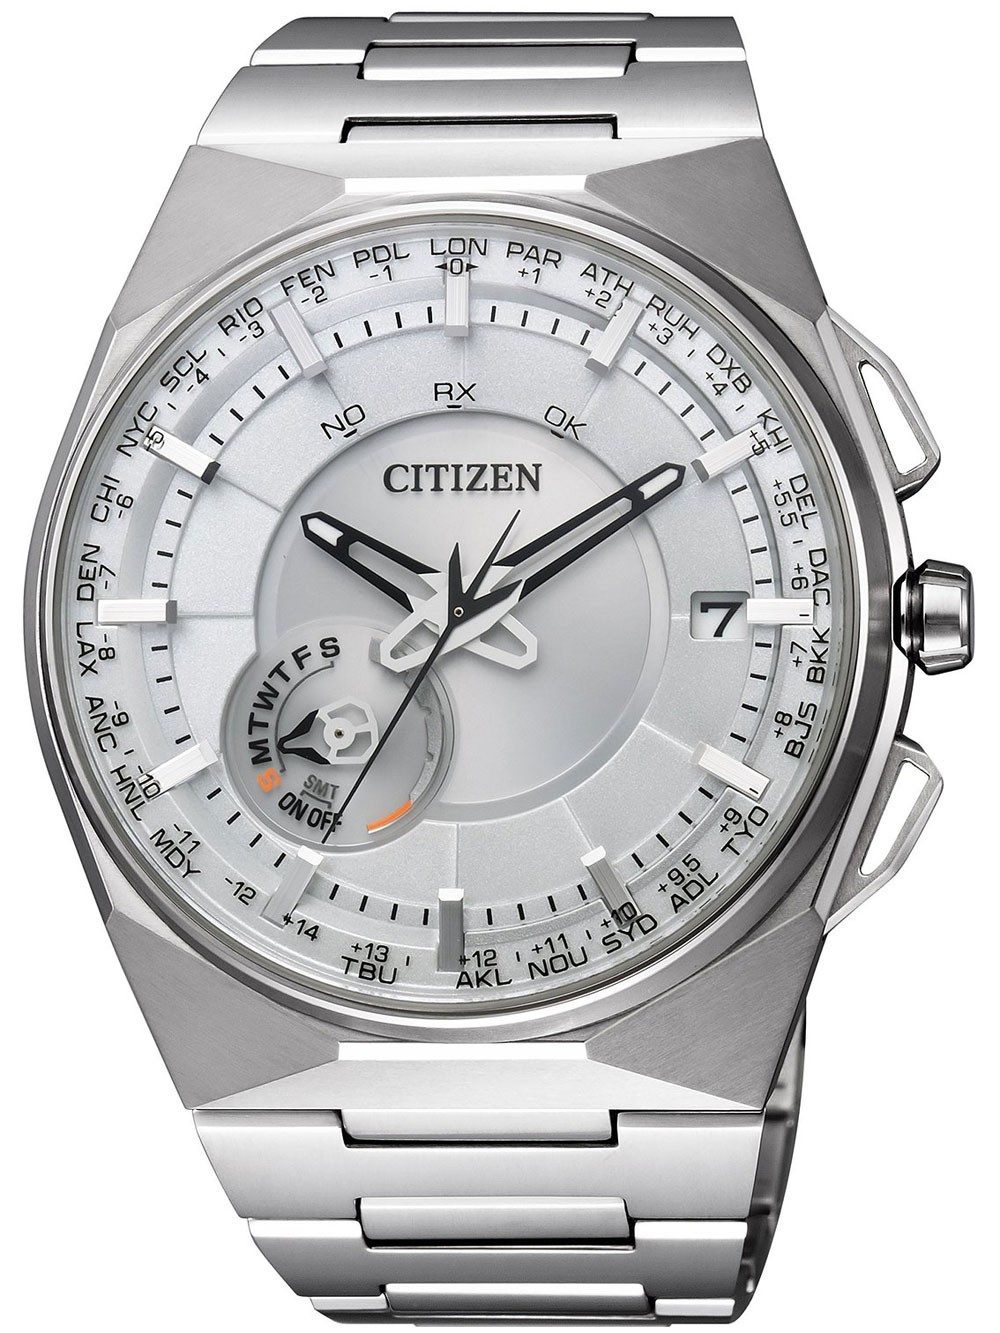 Citizen Eco-Drive Satellite Time System CC2001-57A 48 mm 100M